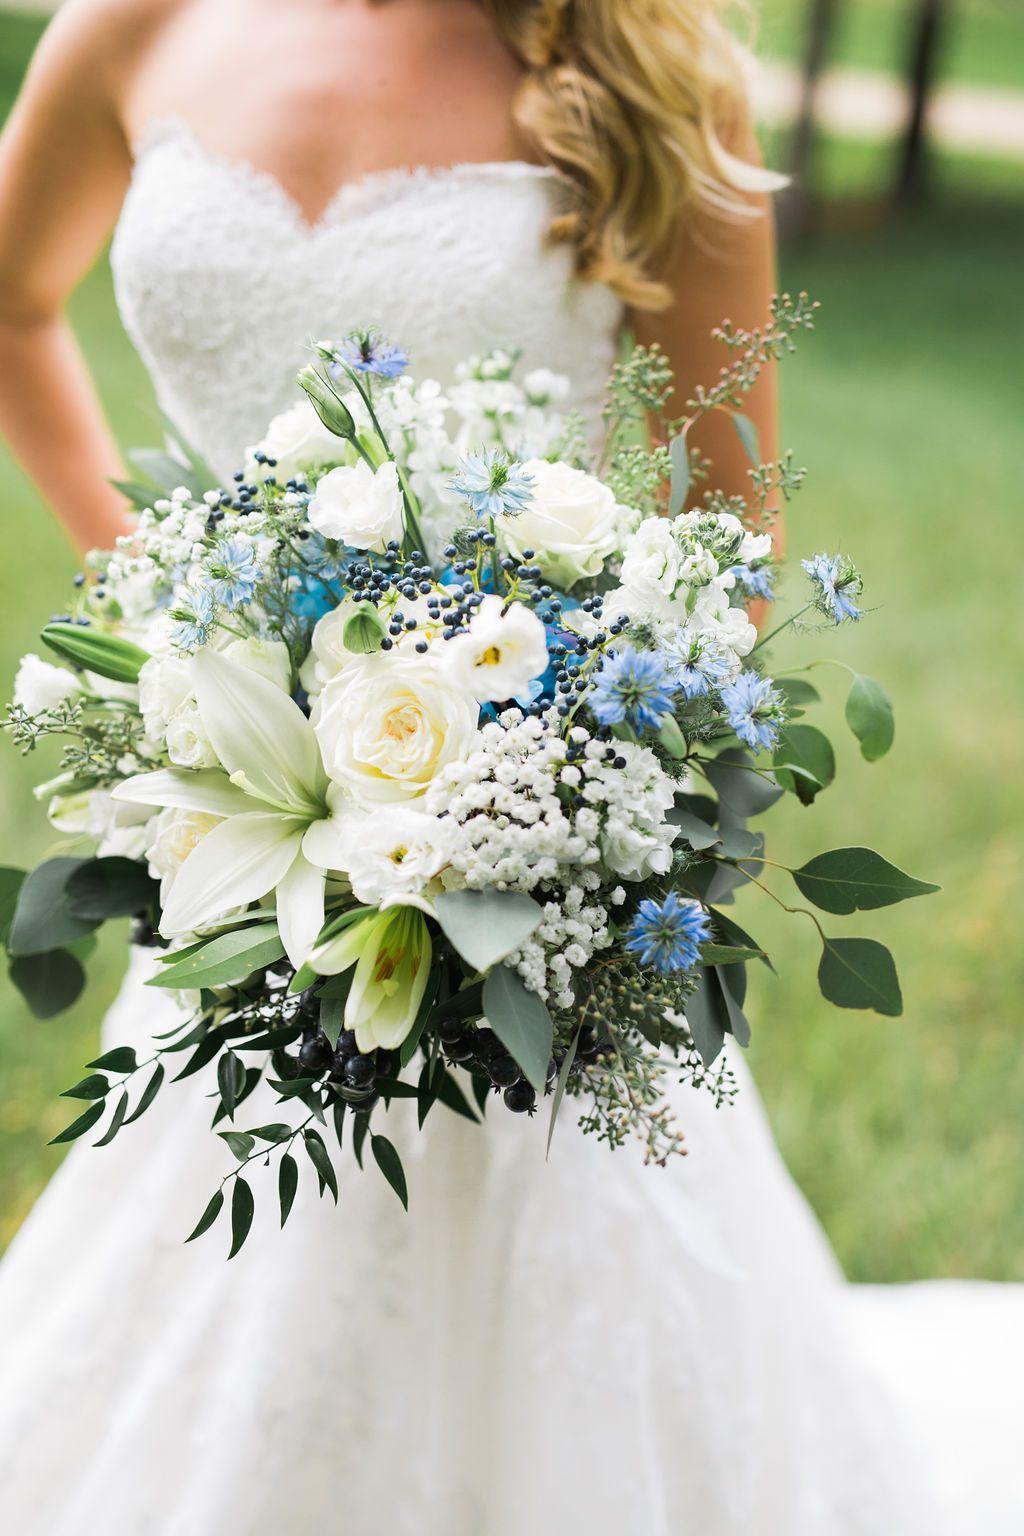 Haley chose a white and blue #bridalbouquet. #flowerbouquetwedding